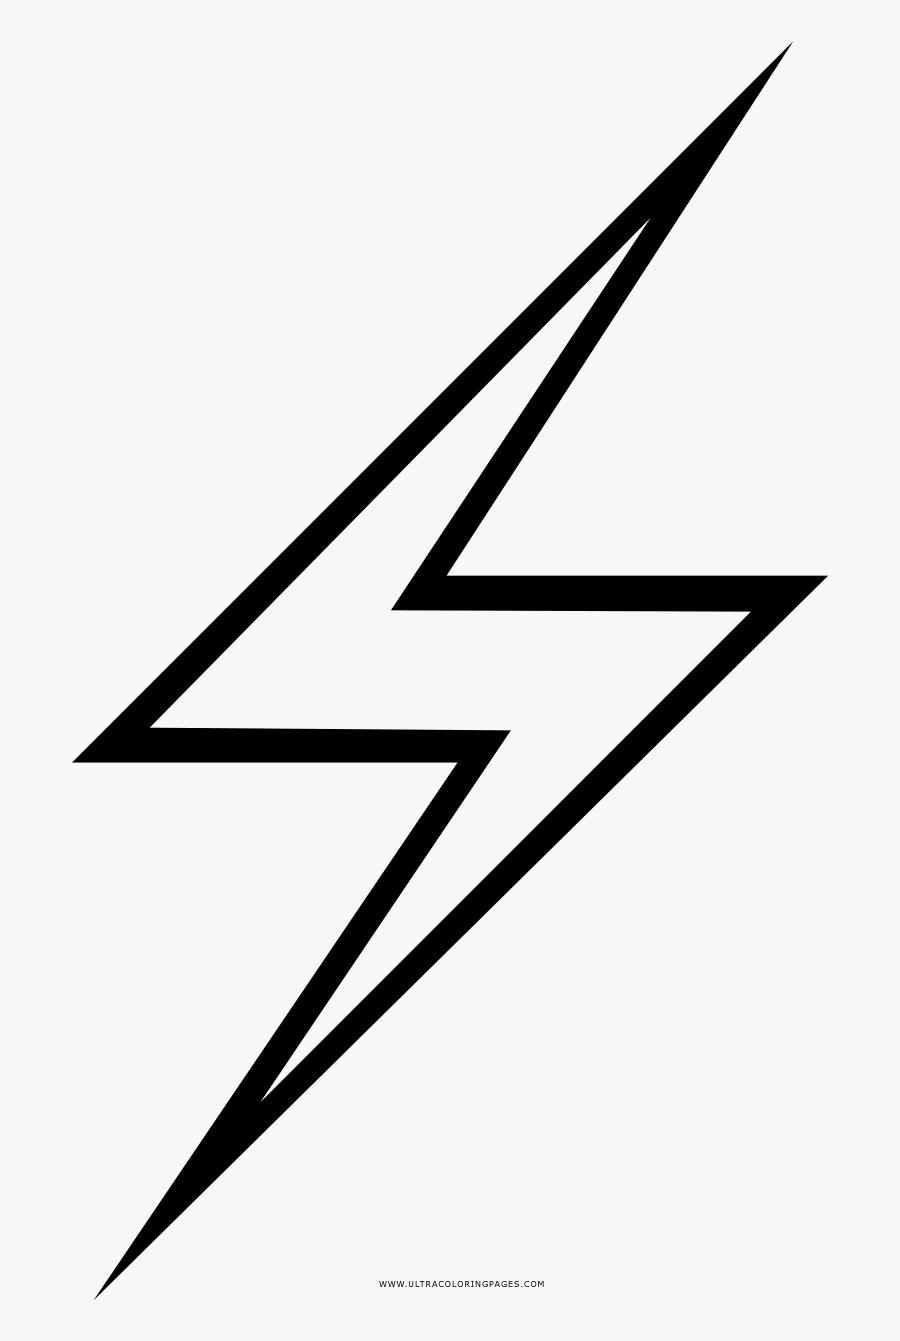 Free Lightning Bolt Stencil - Simple Lightning Bolt Drawing, Transparent Clipart